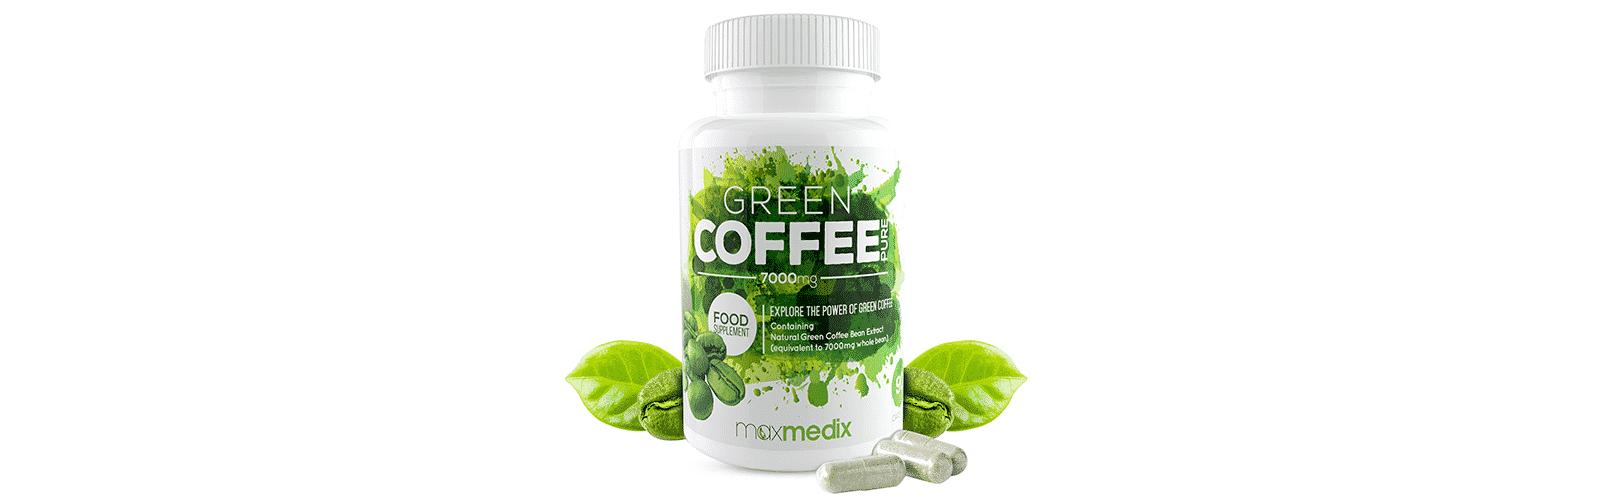 Acheter Green Coffee Bean Pure en ligne | Prix & Avis